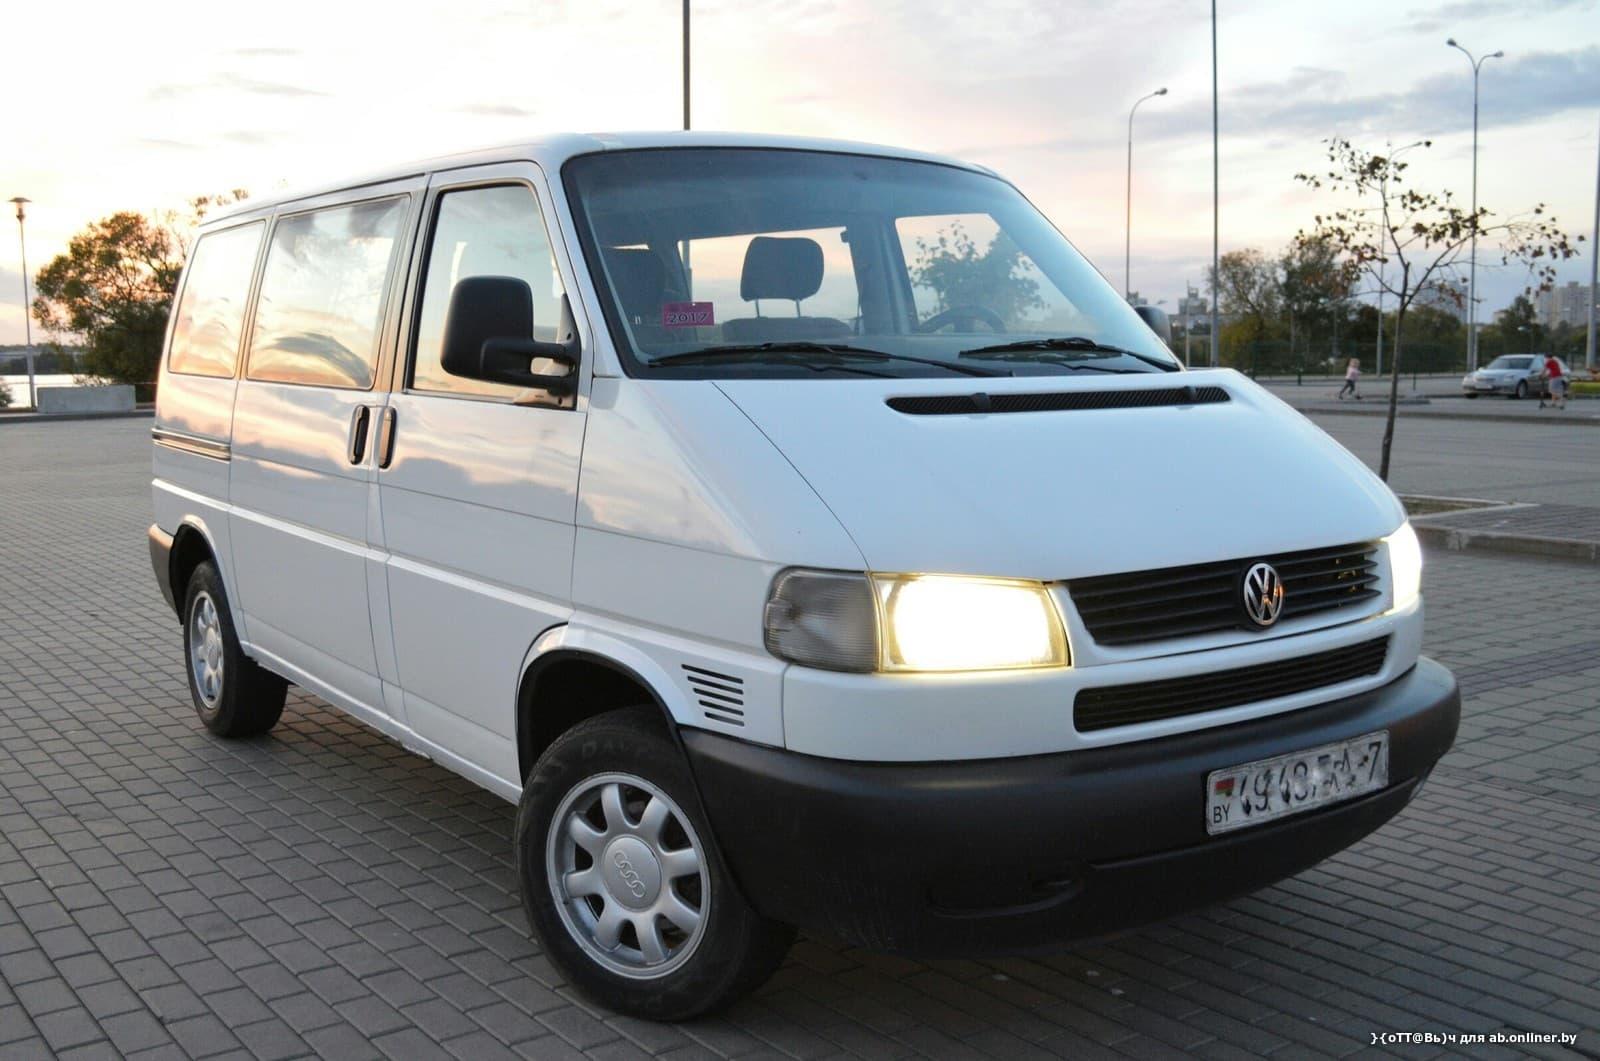 Volkswagen T4 Caravelle acv